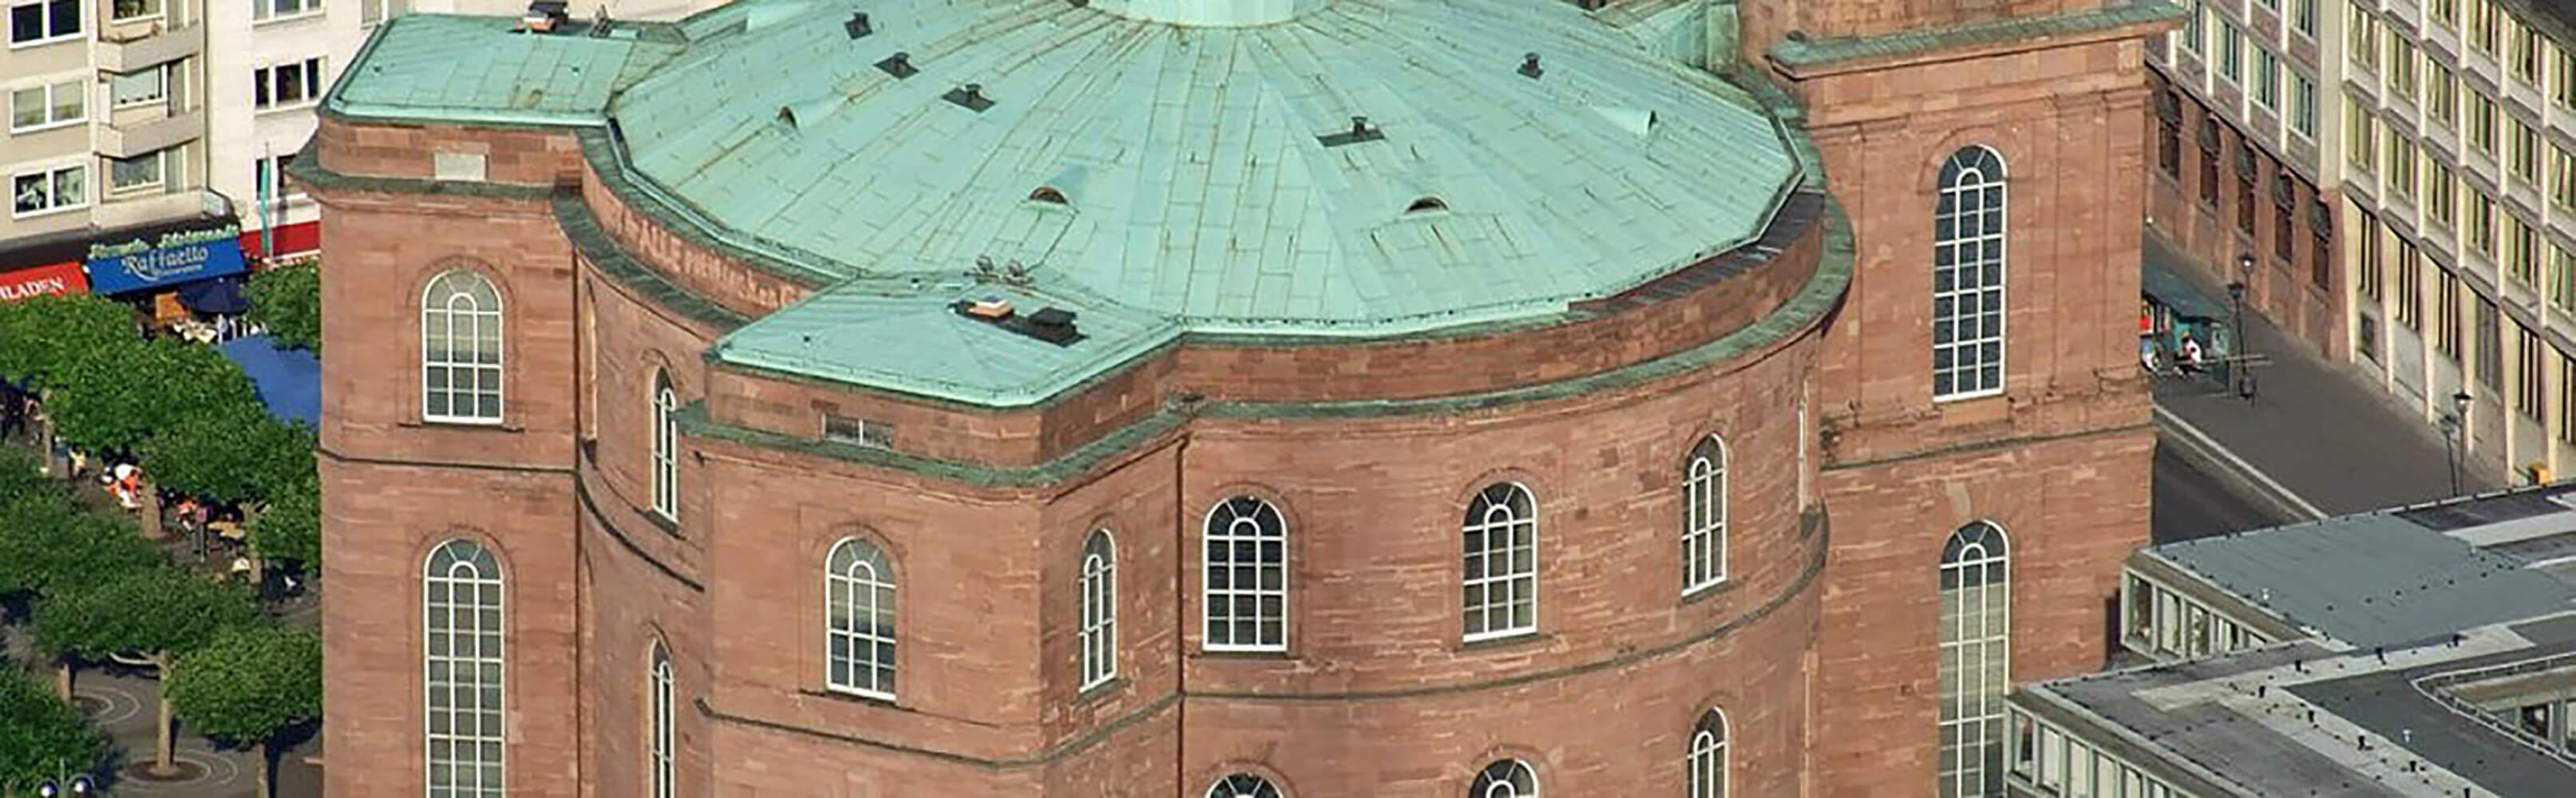 Frankfurter Paulskirche 1